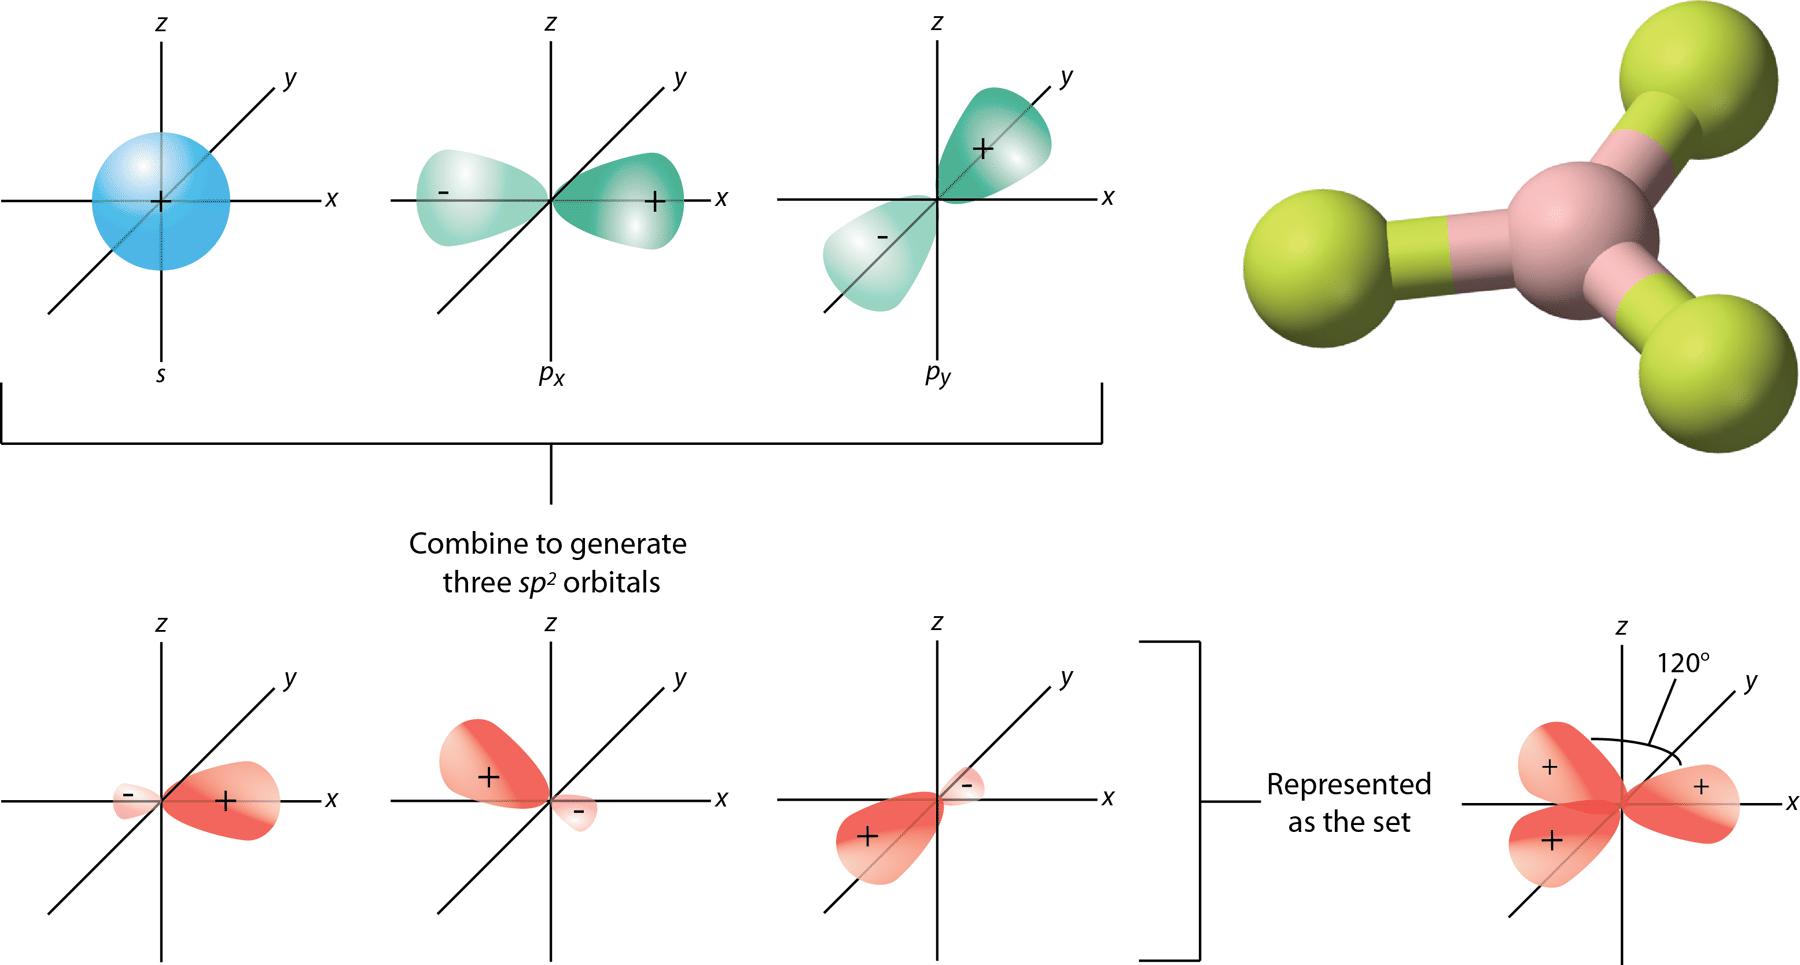 Image of how s and p orbitals combine to form sp2 orbitals